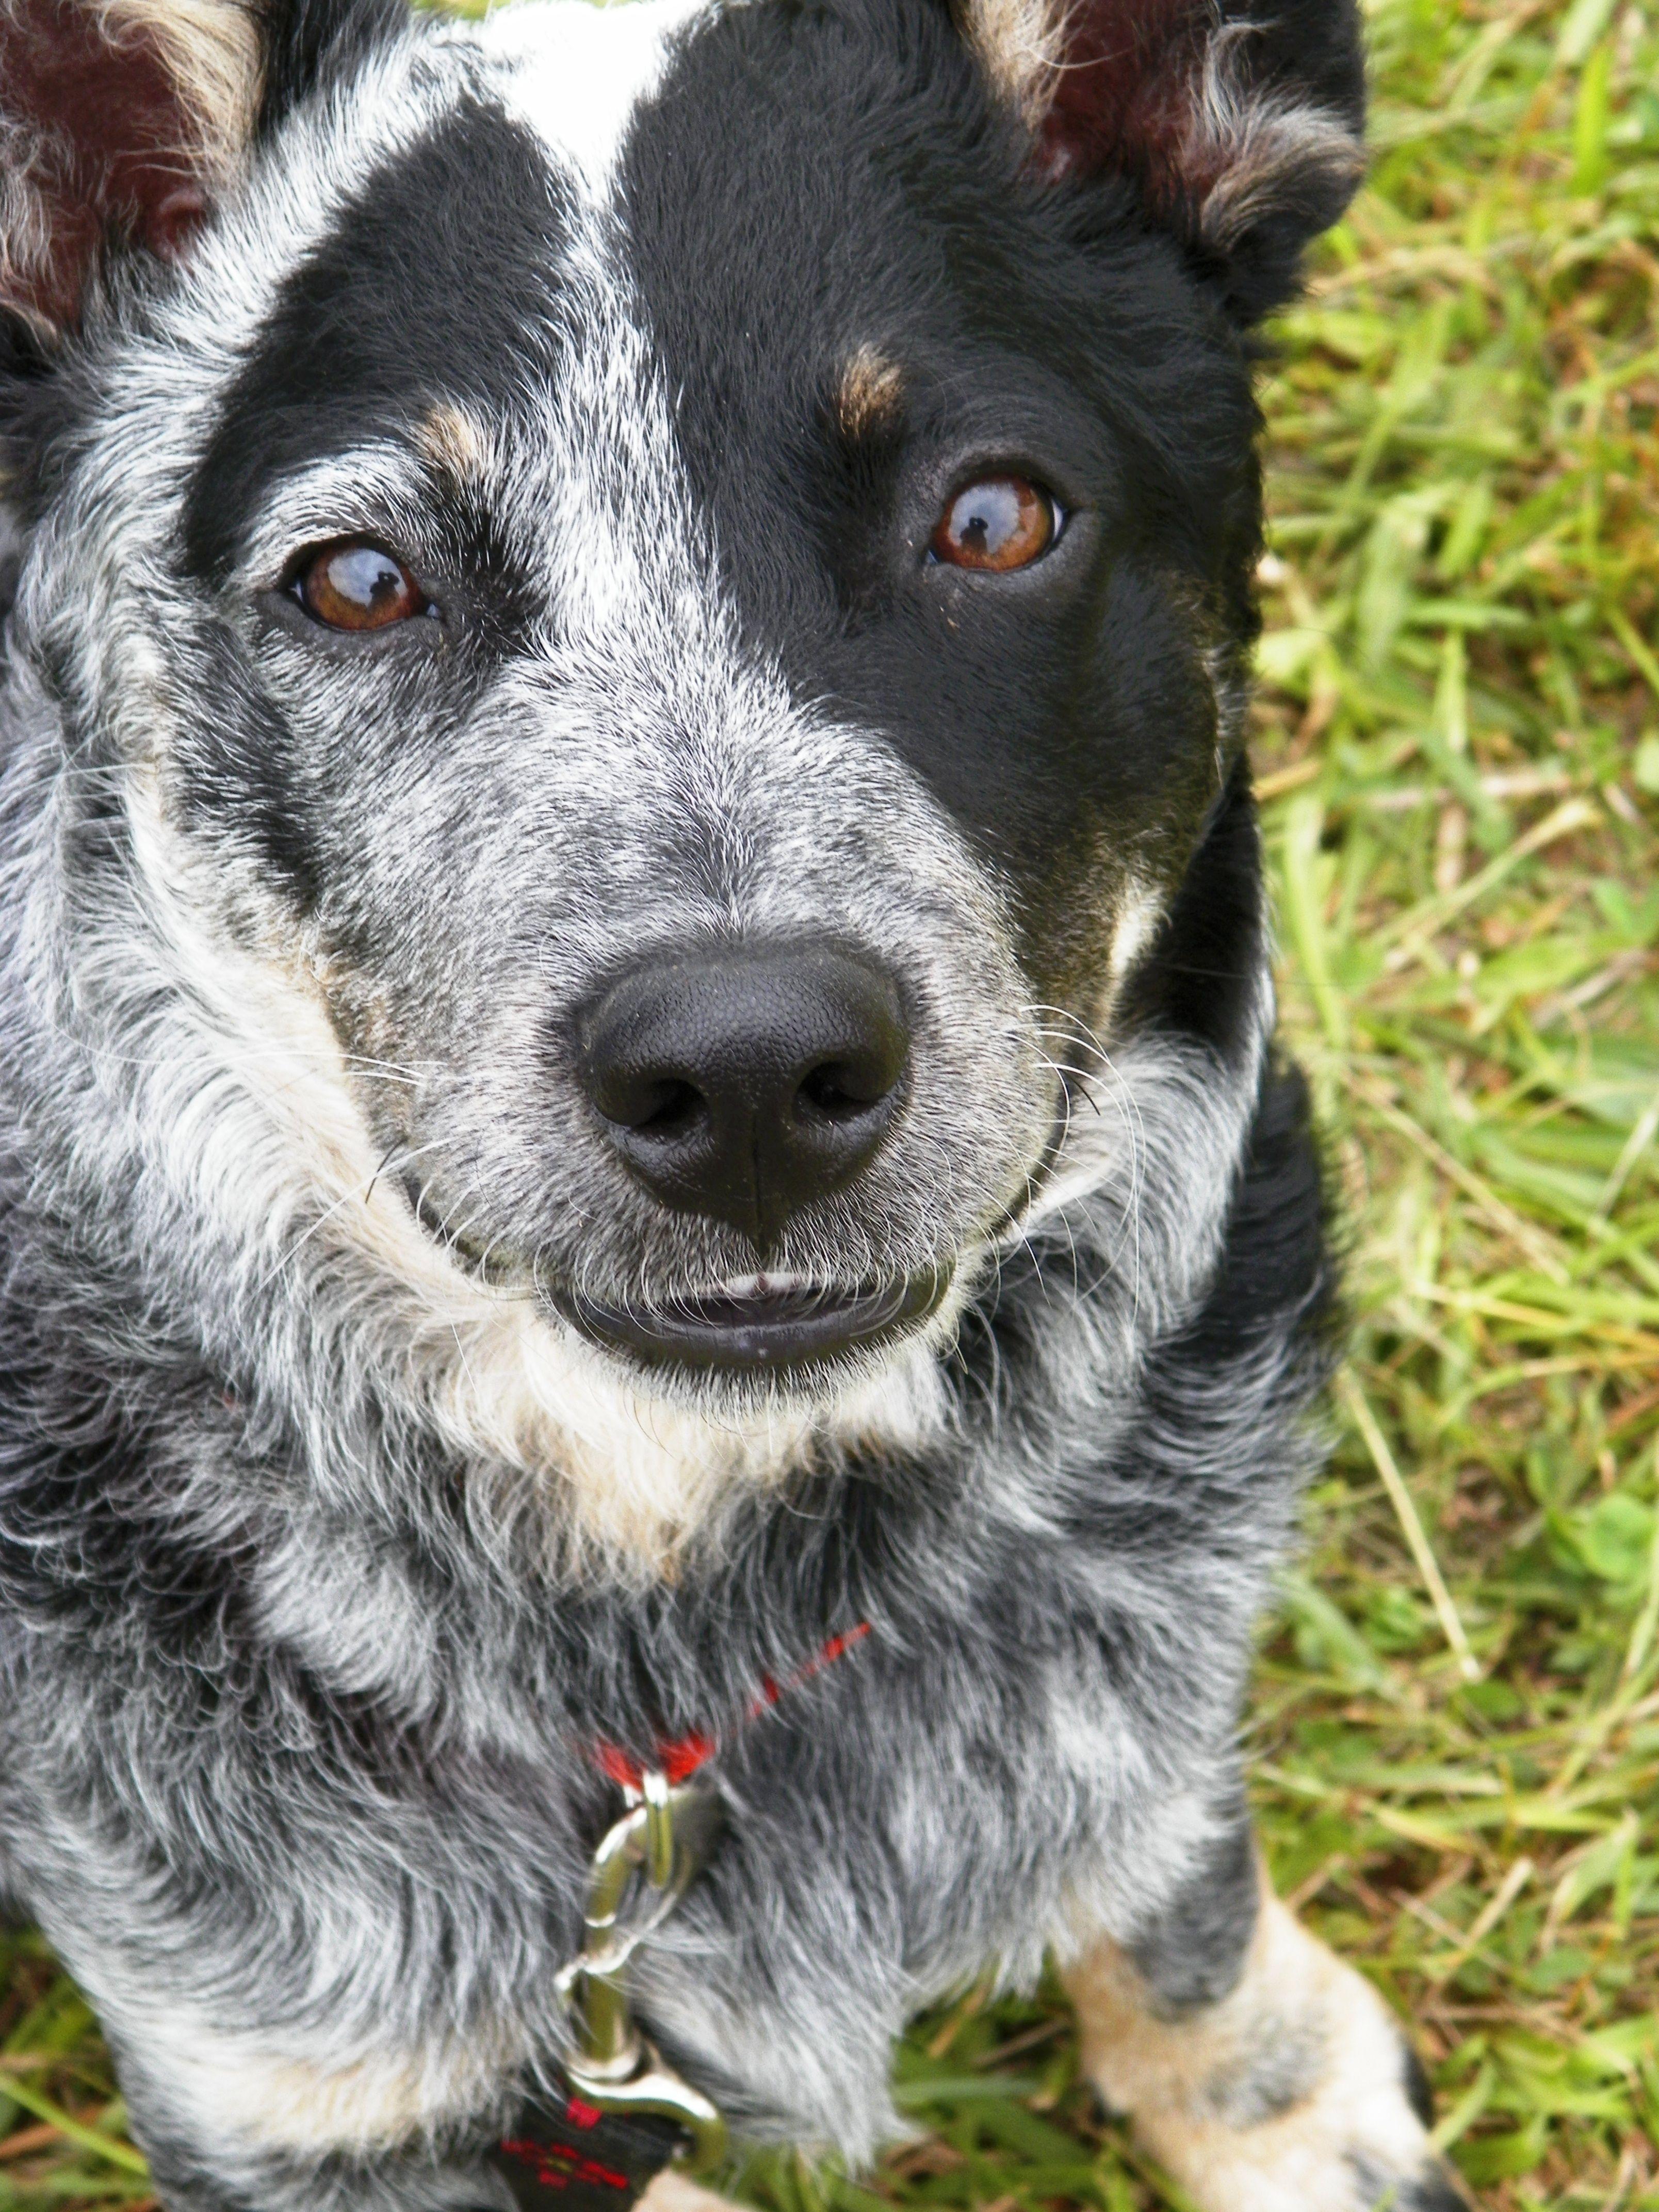 Turbo, Smiling. my Blue Heeler (Austrailian Cattle Dog) pup